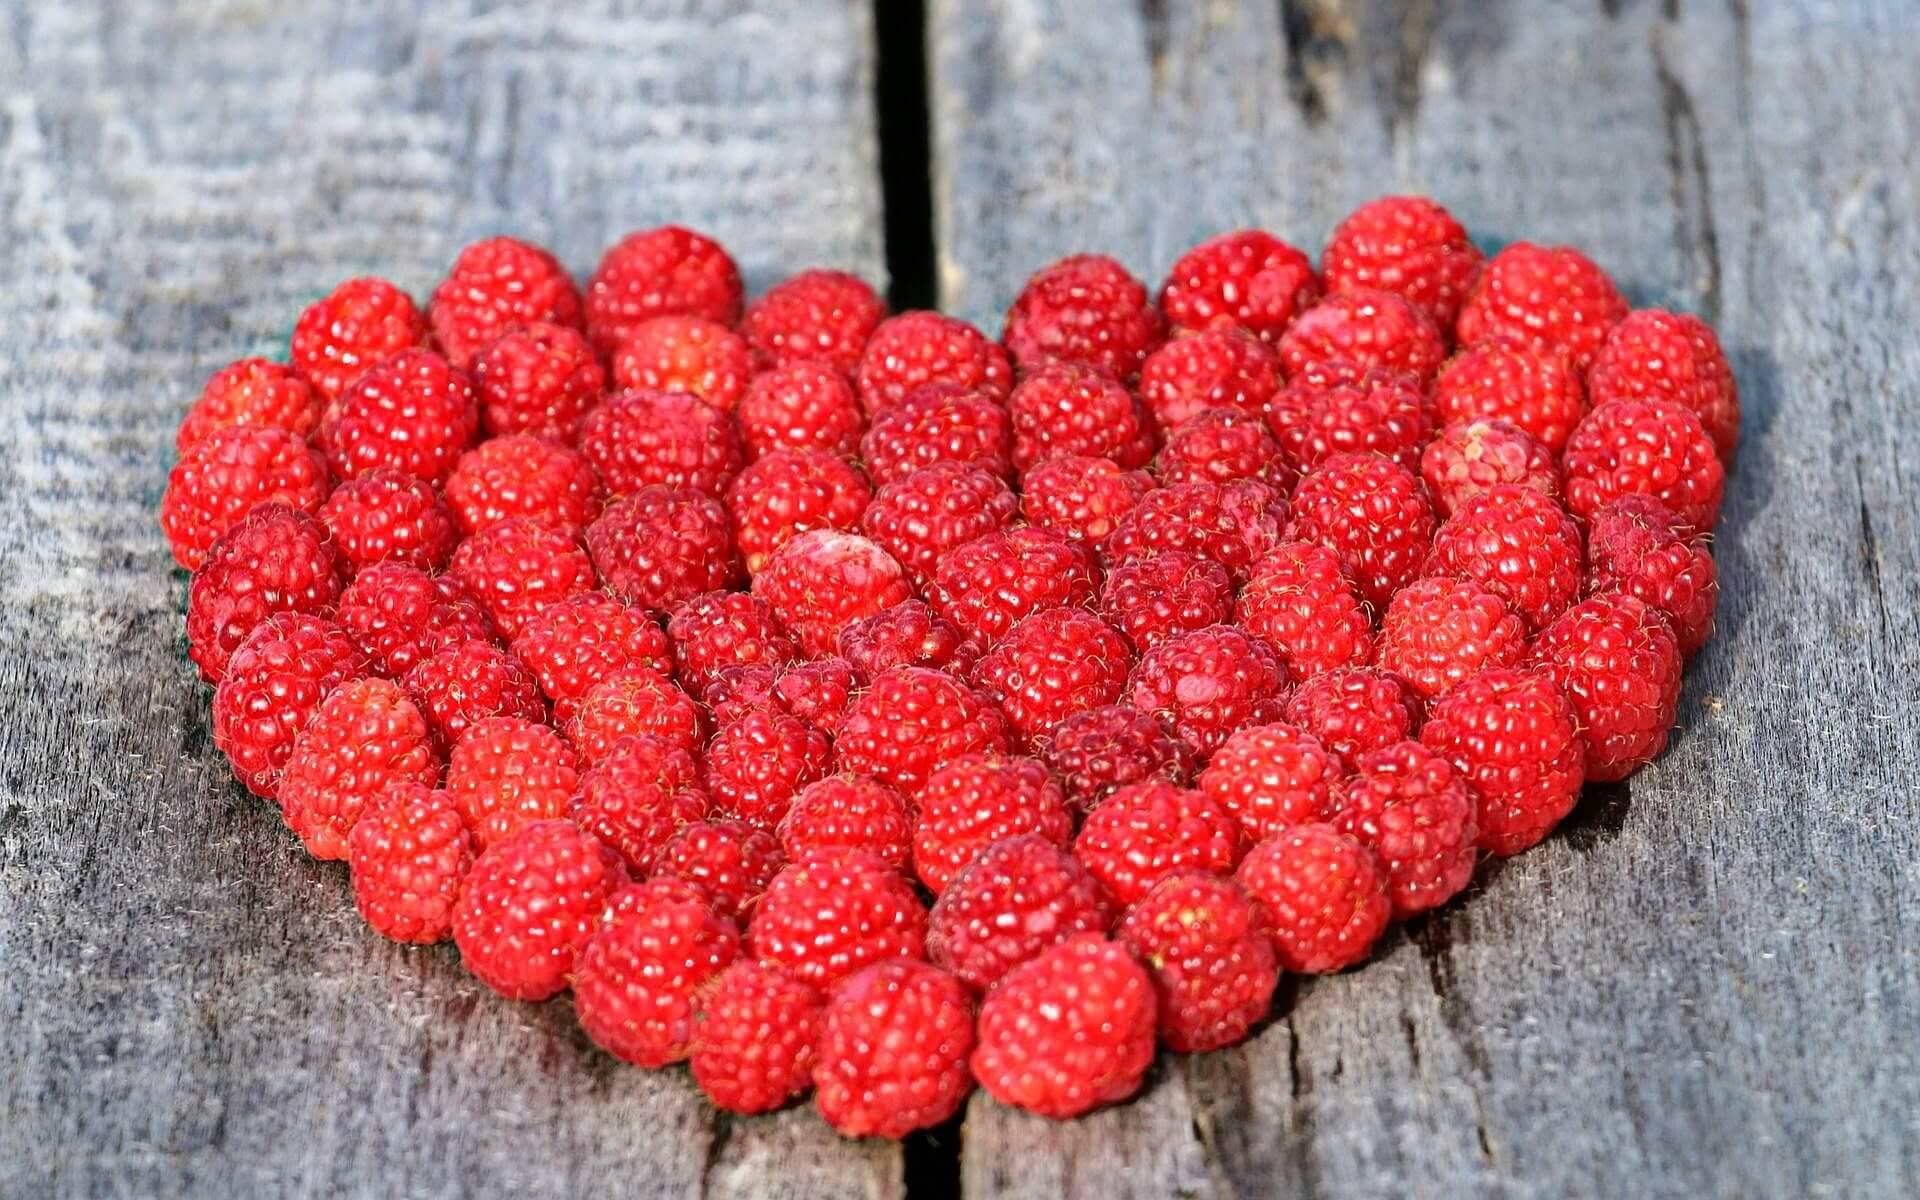 strawberry heart wallpaper background